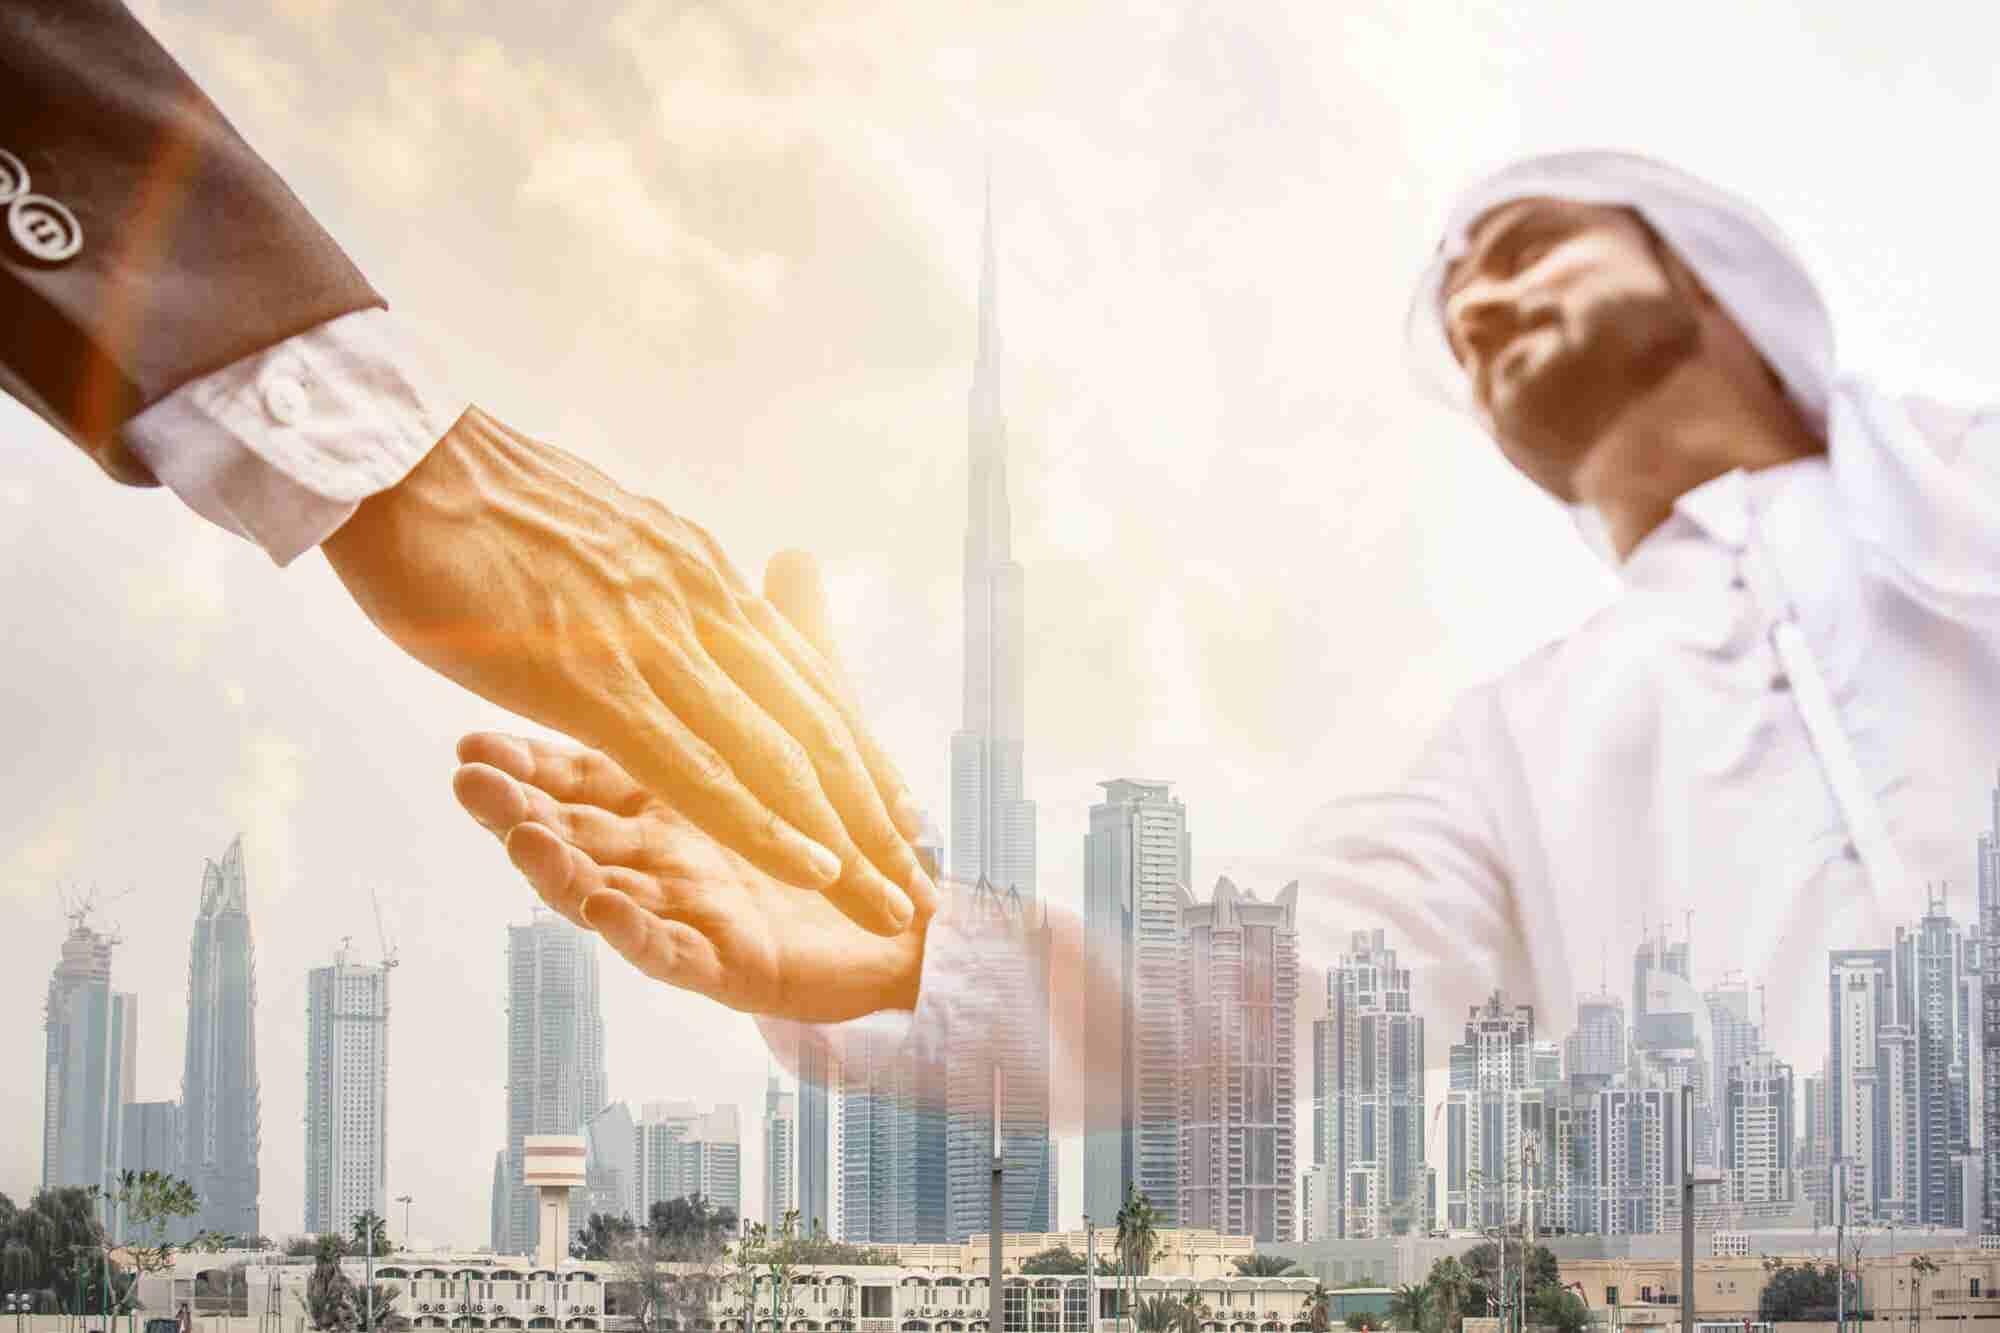 Matchmaking For Entrepreneurs: Dubai Startup Hub Launches Co-Founder Dubai Program